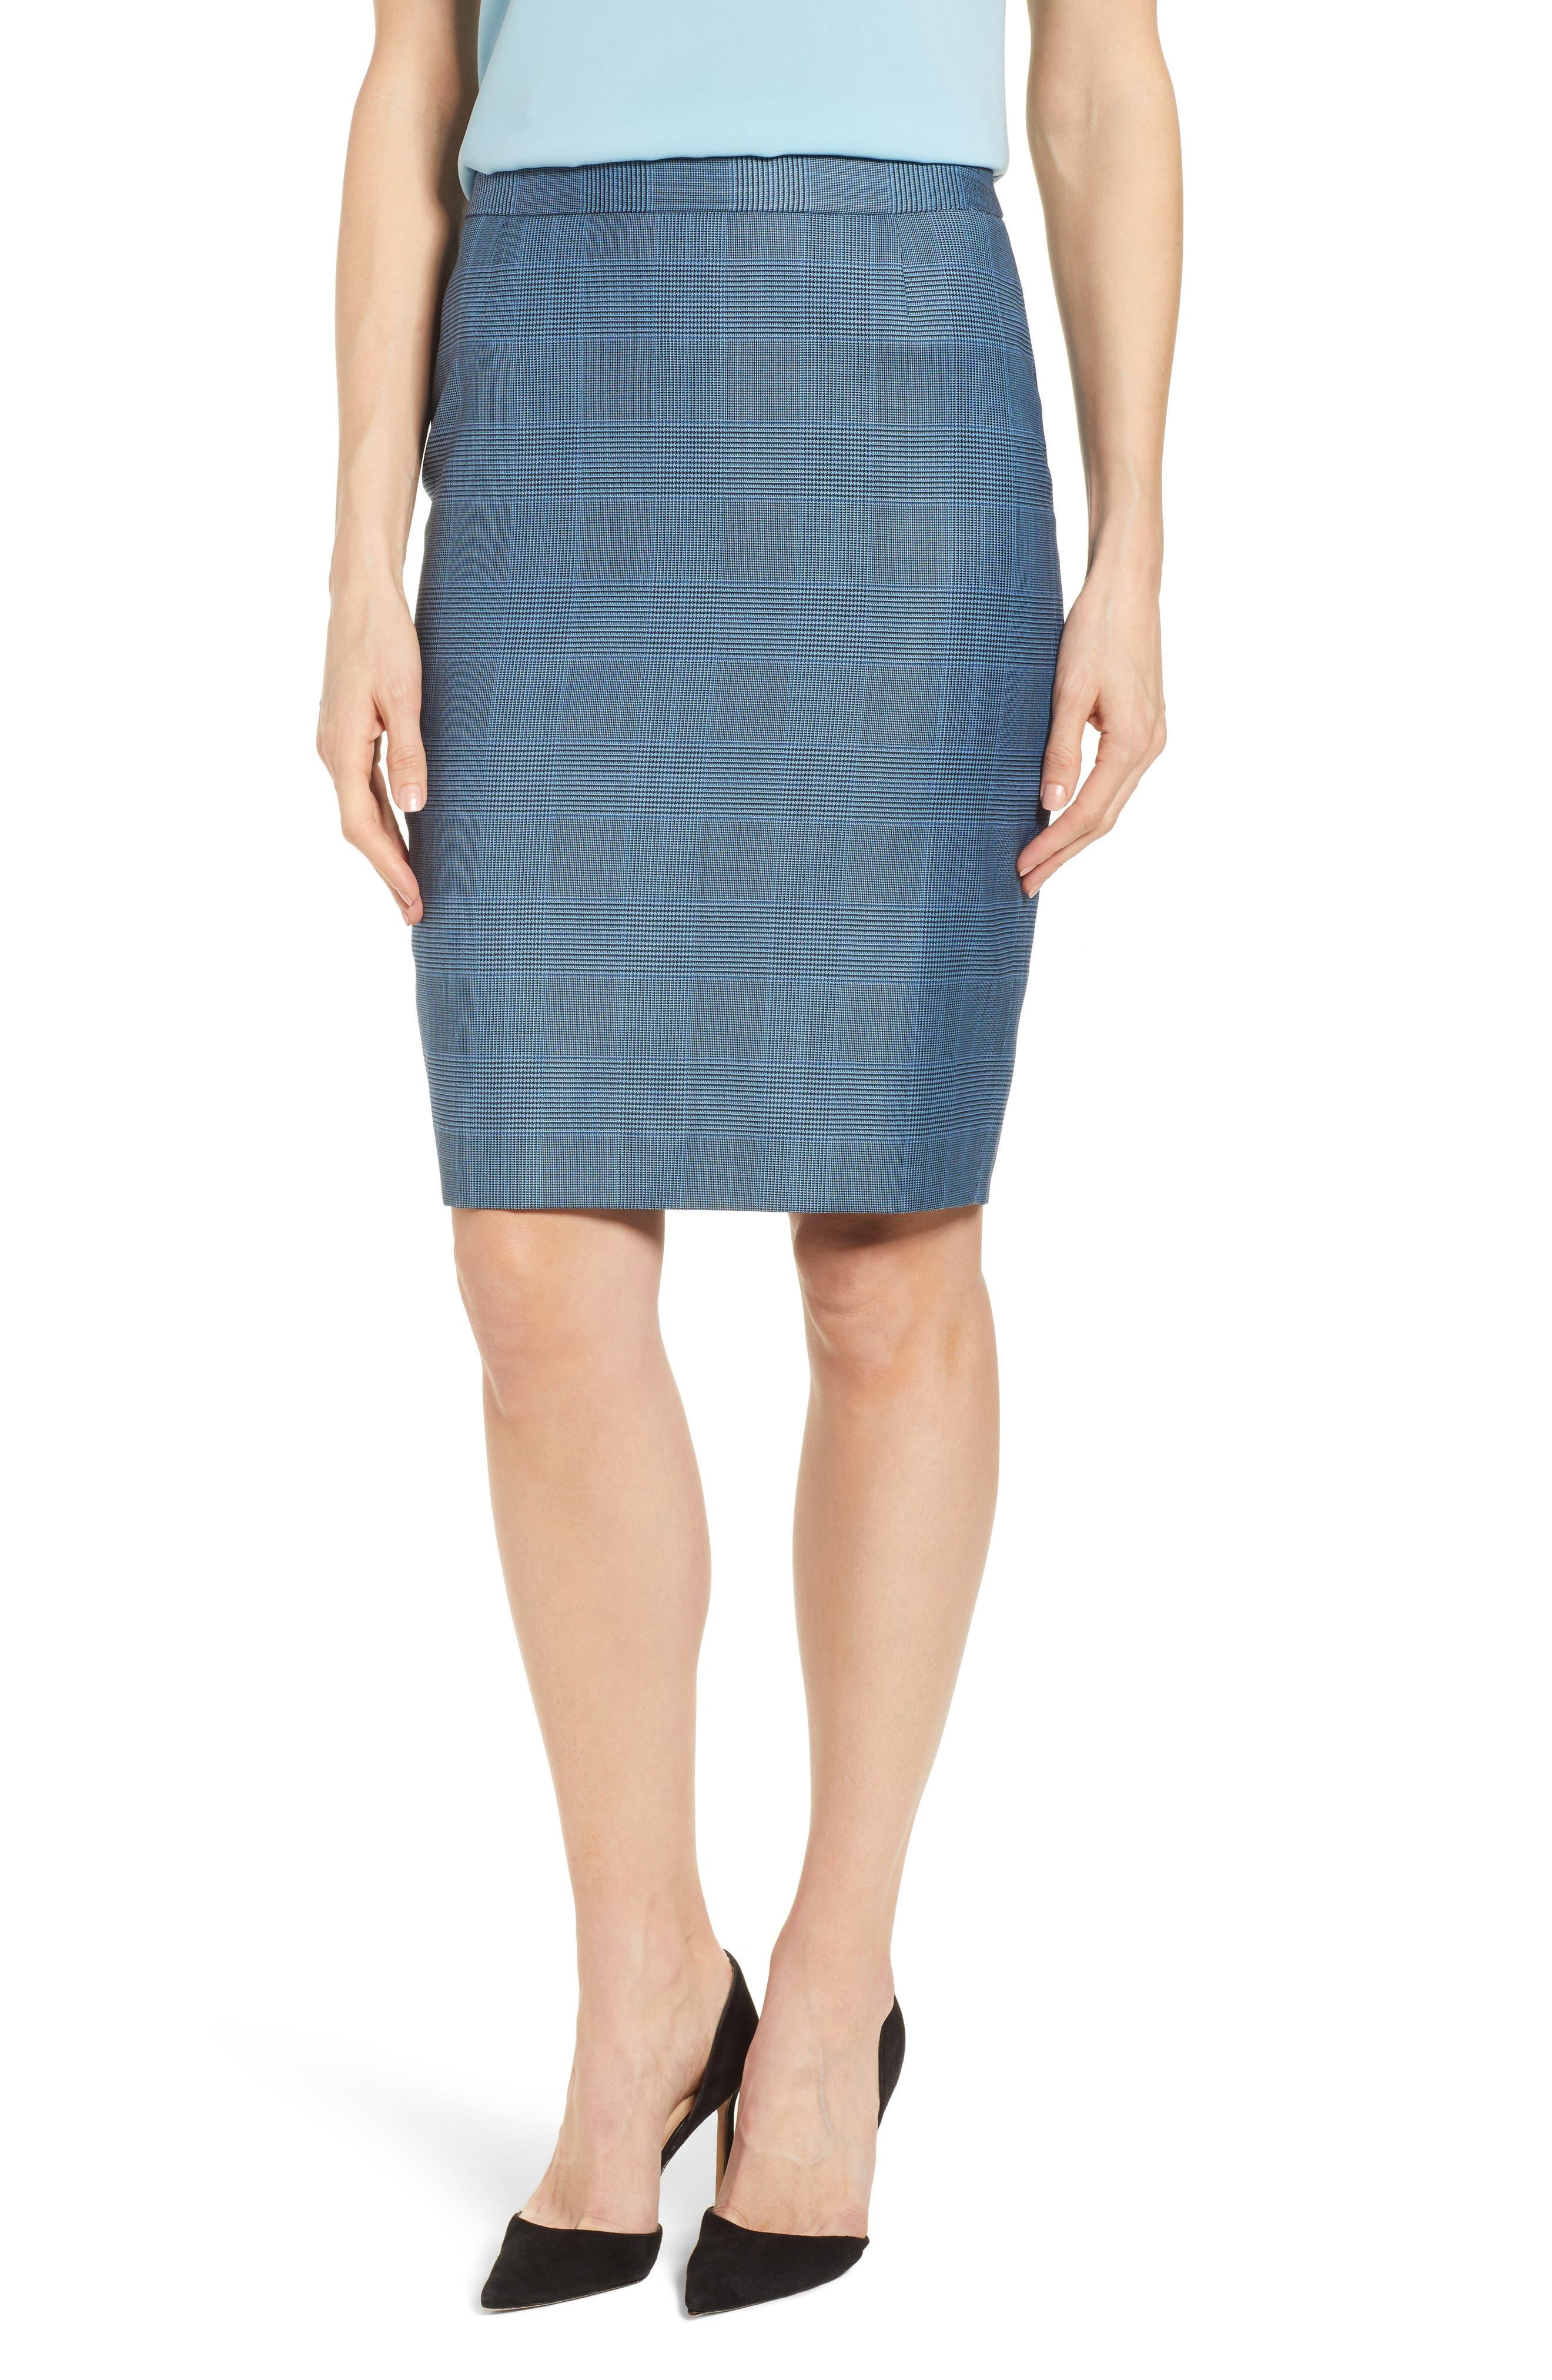 Vimena Glencheck Stretch Wool Pencil Skirt,                         Main,                         color, Sailor Blue Fantasy